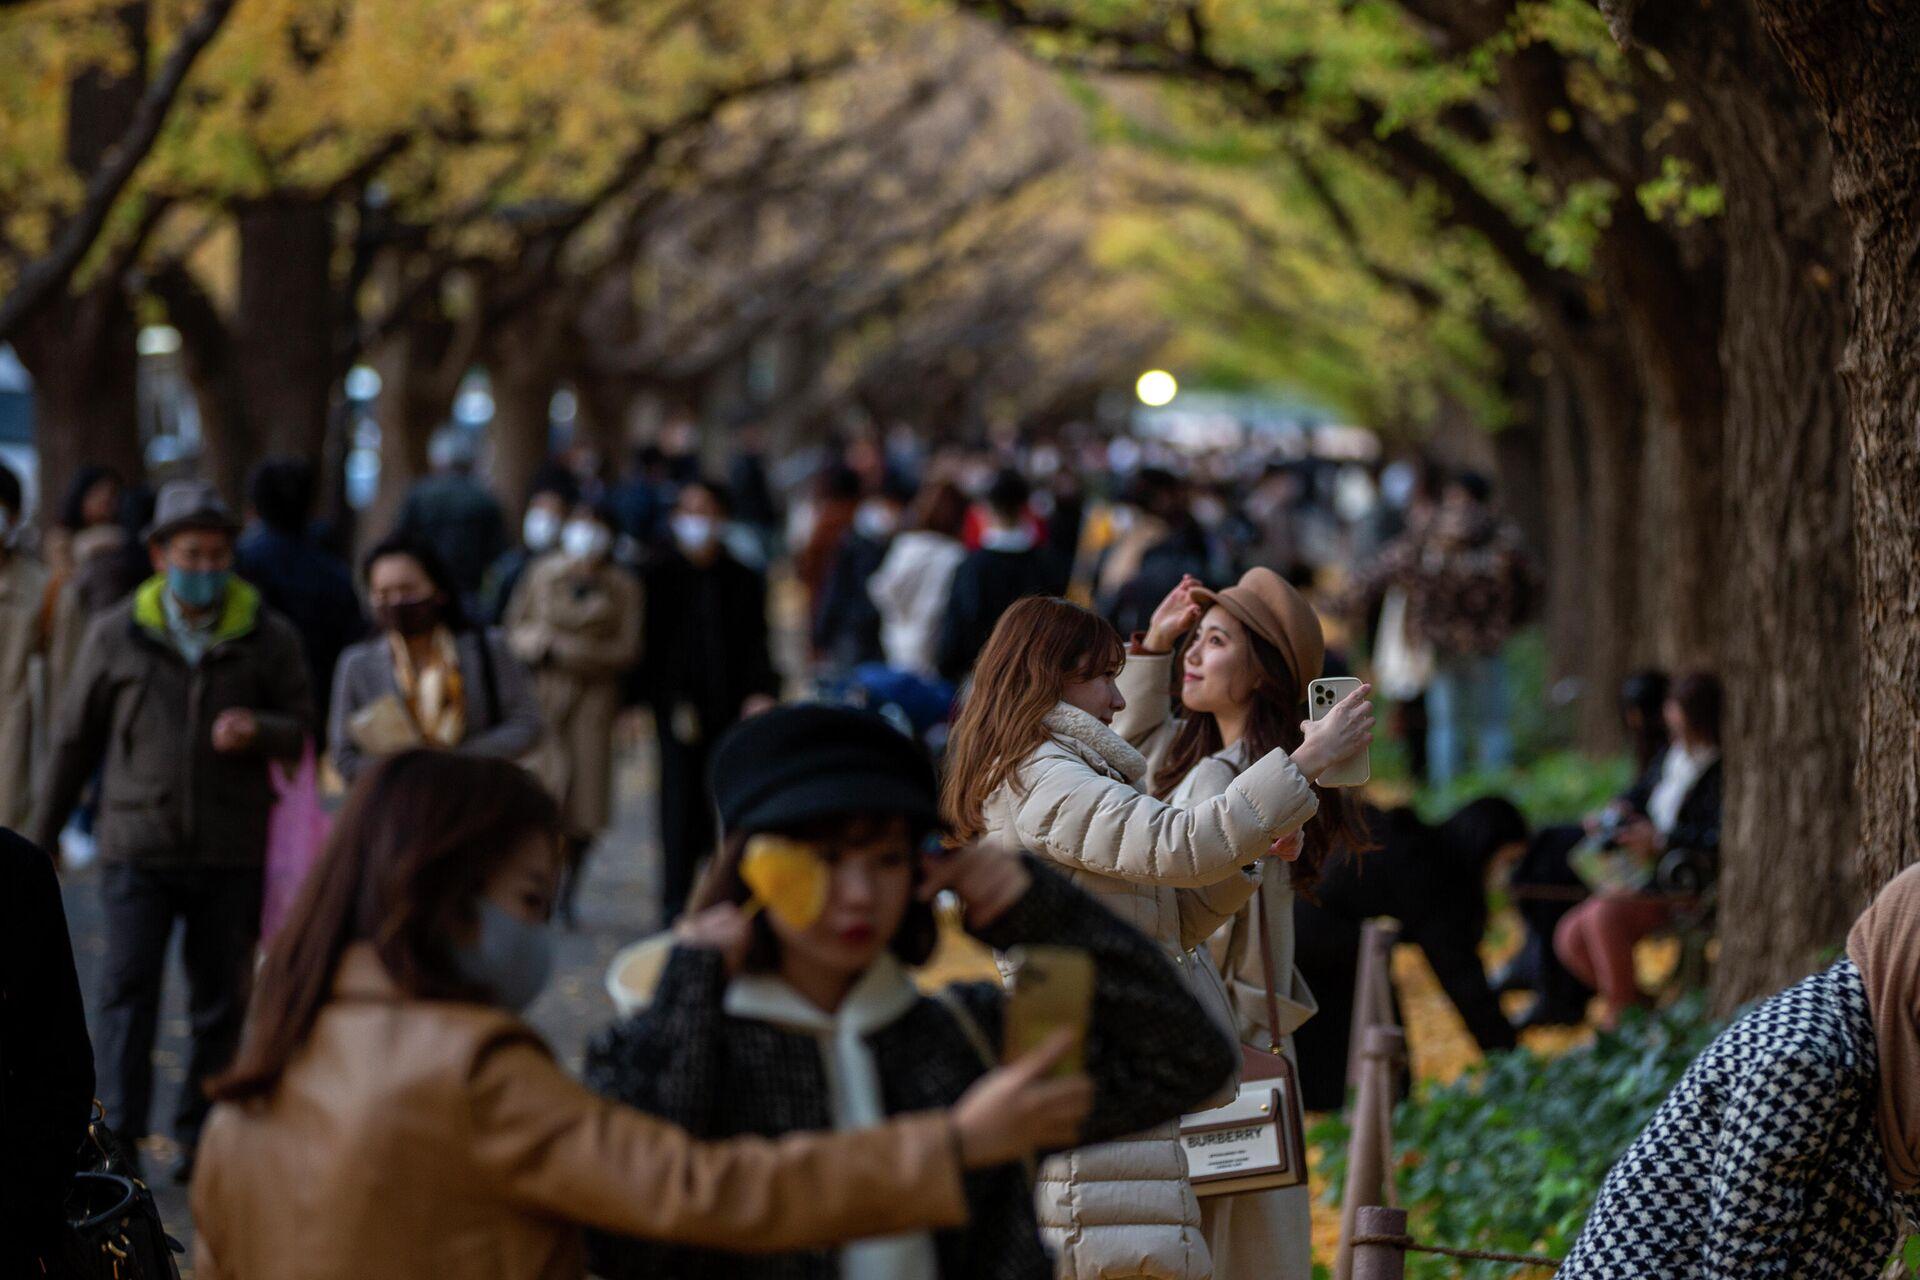 Люди на прогулке в Токио  - РИА Новости, 1920, 11.12.2020